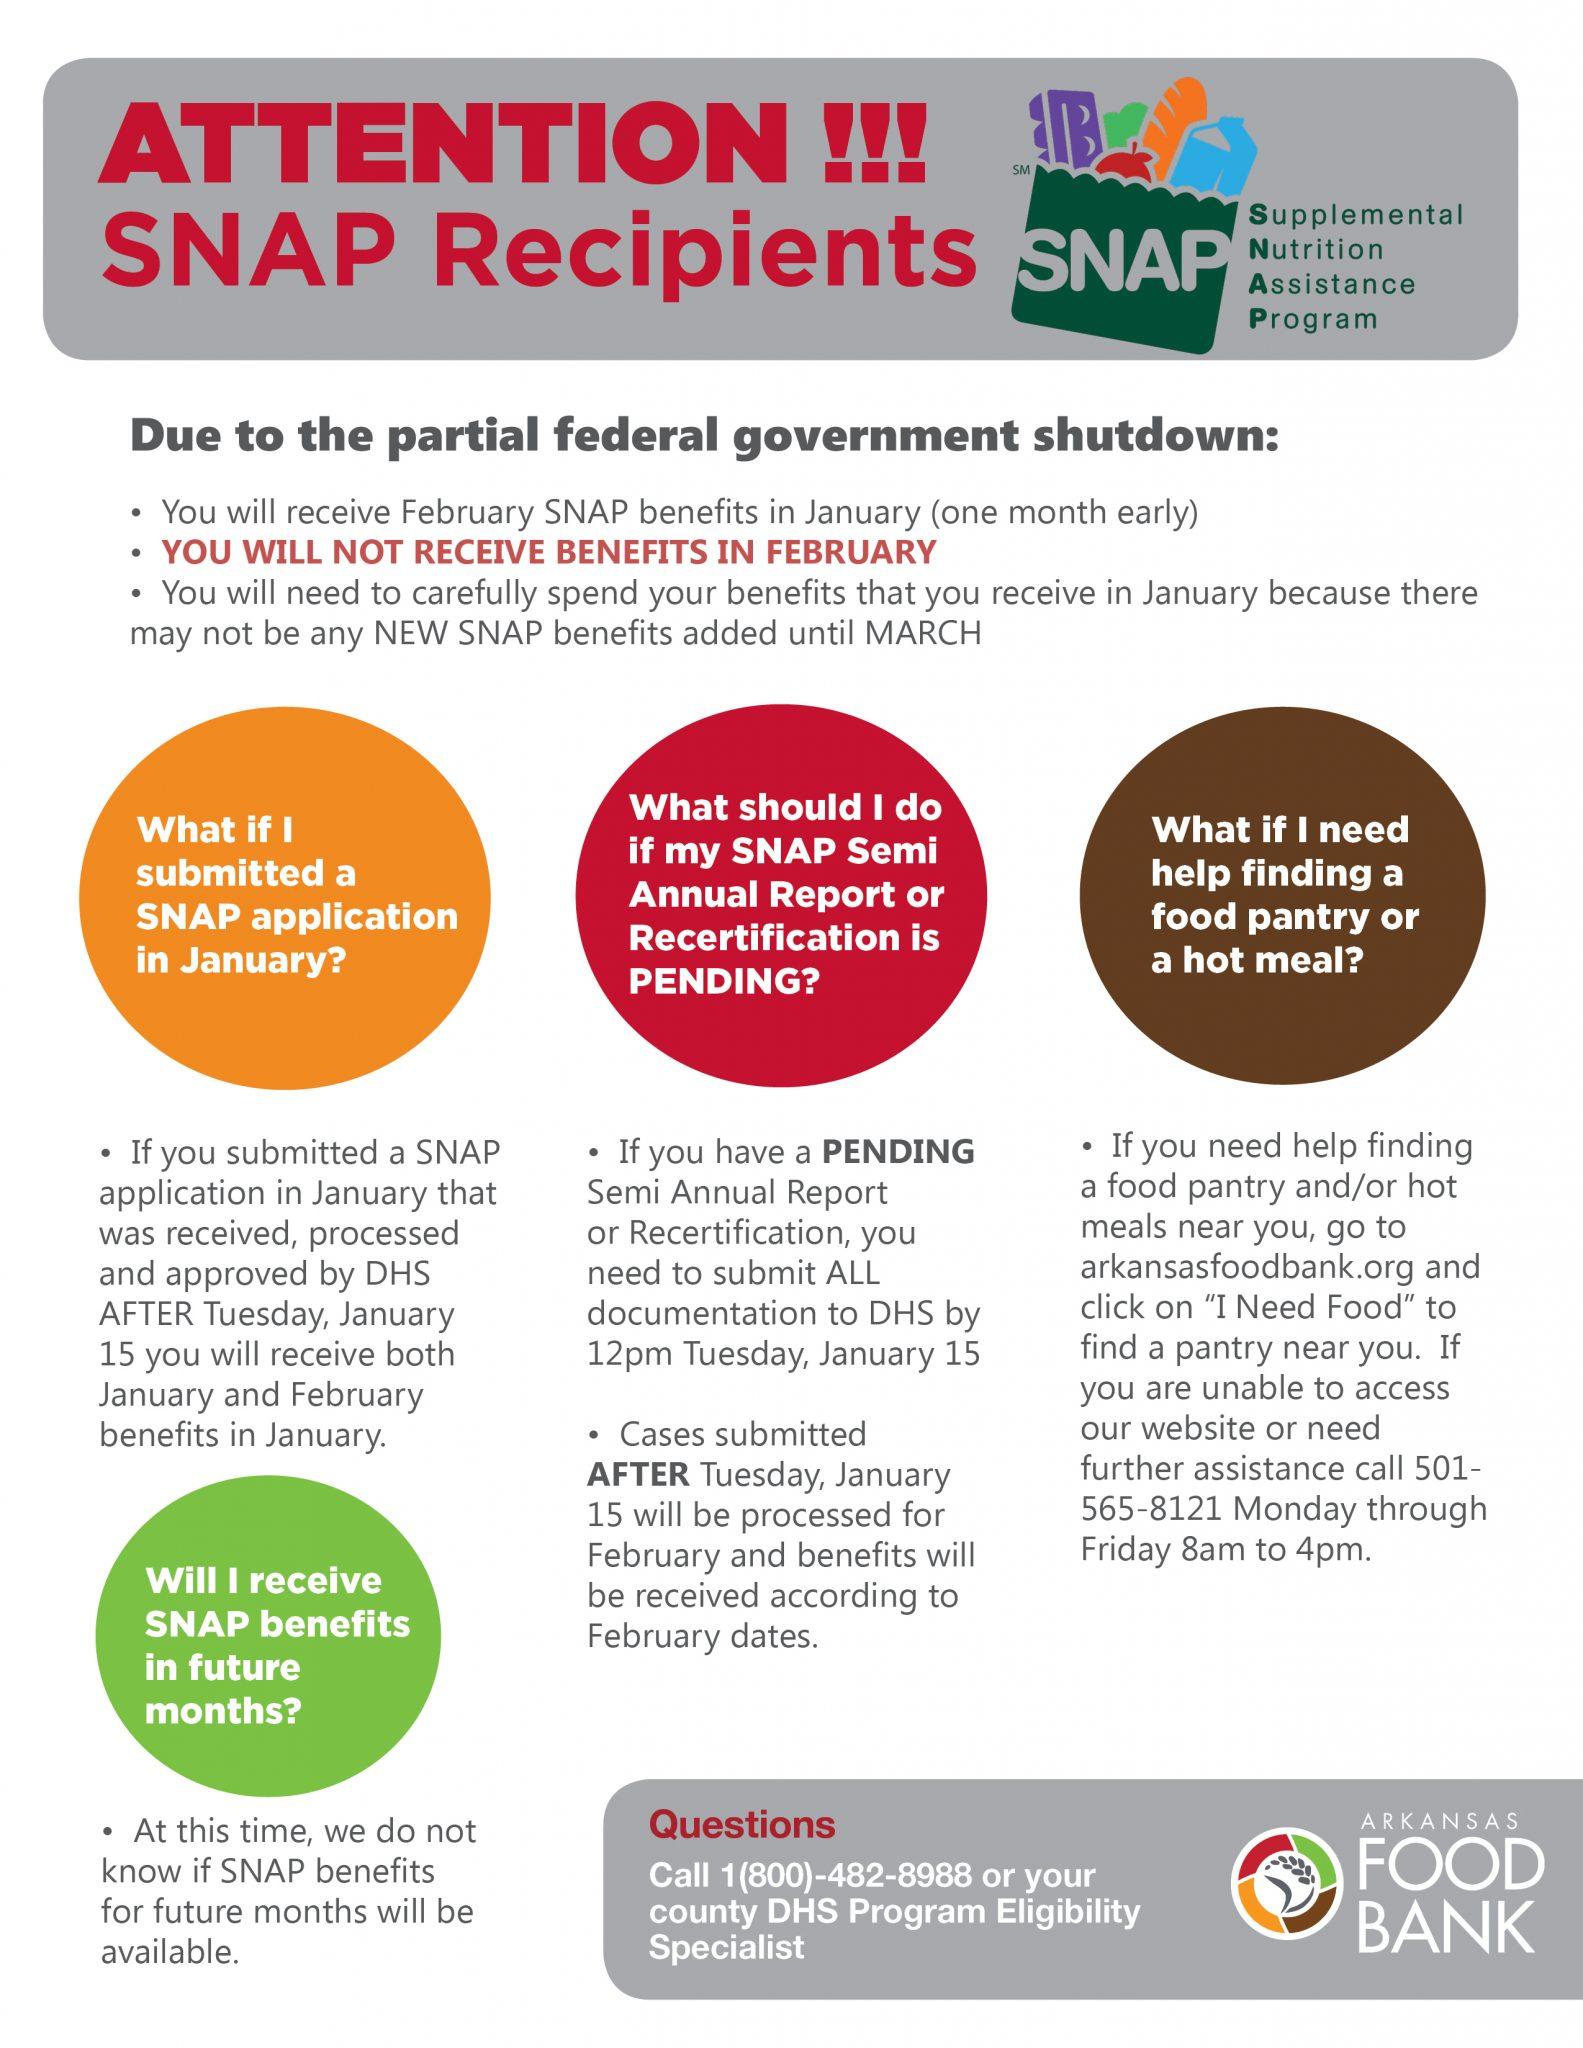 SNAP Government Shutdown Help Sheet 1 2019 - Arkansas Foodbank